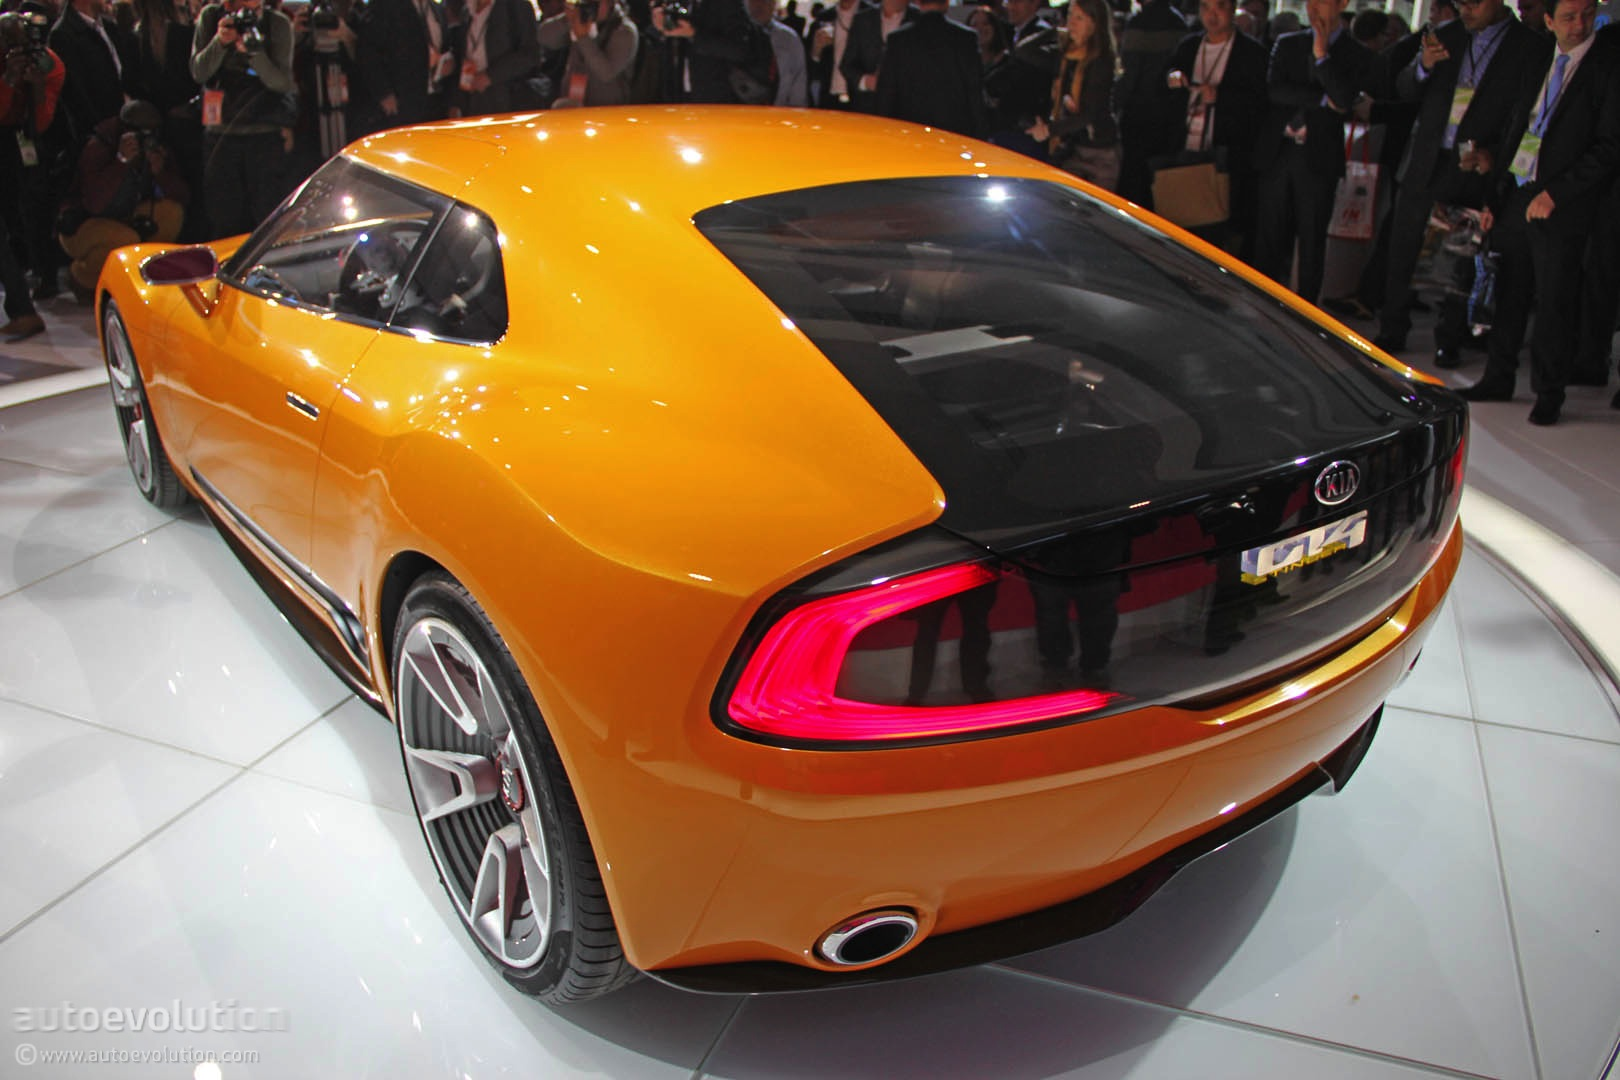 Three Wheel Car >> Kia GT4 Stinger Concept Is a Sexy Korean Toyobaru [Live Photos] - autoevolution